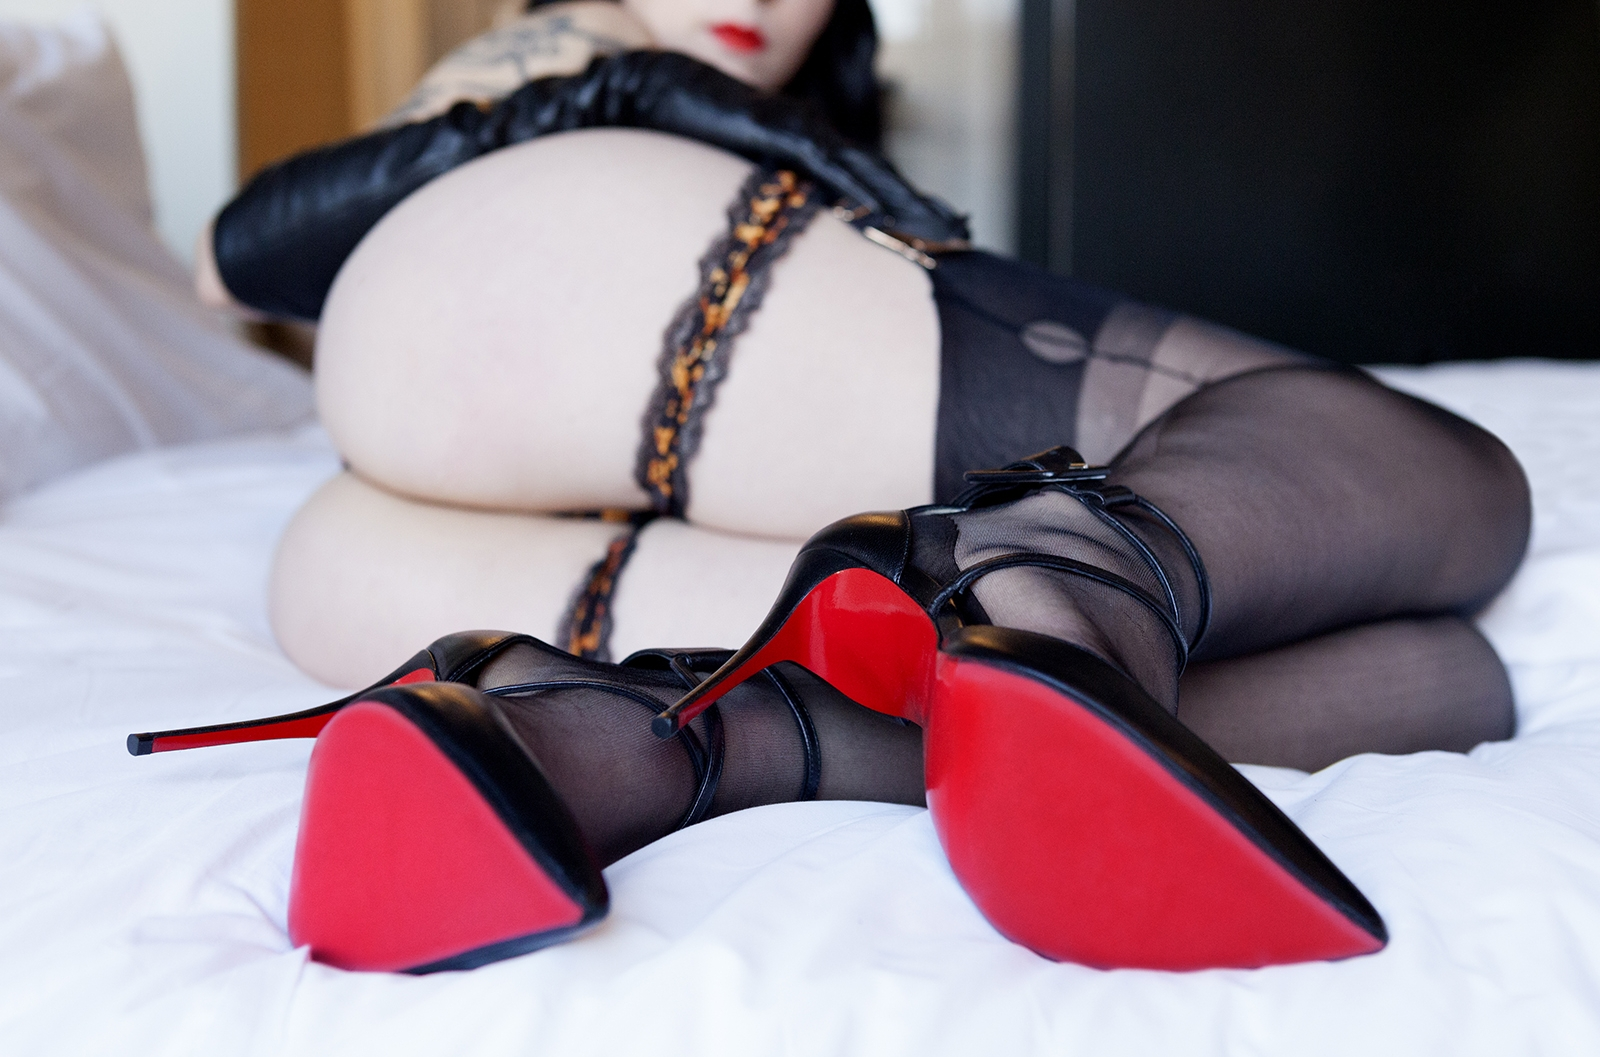 mistress_ramona_ryder_stocking_fetish_louboutin_sf_garter_agent_provocateur_red_lipstick_leather_gloves_dominatrix.jpg